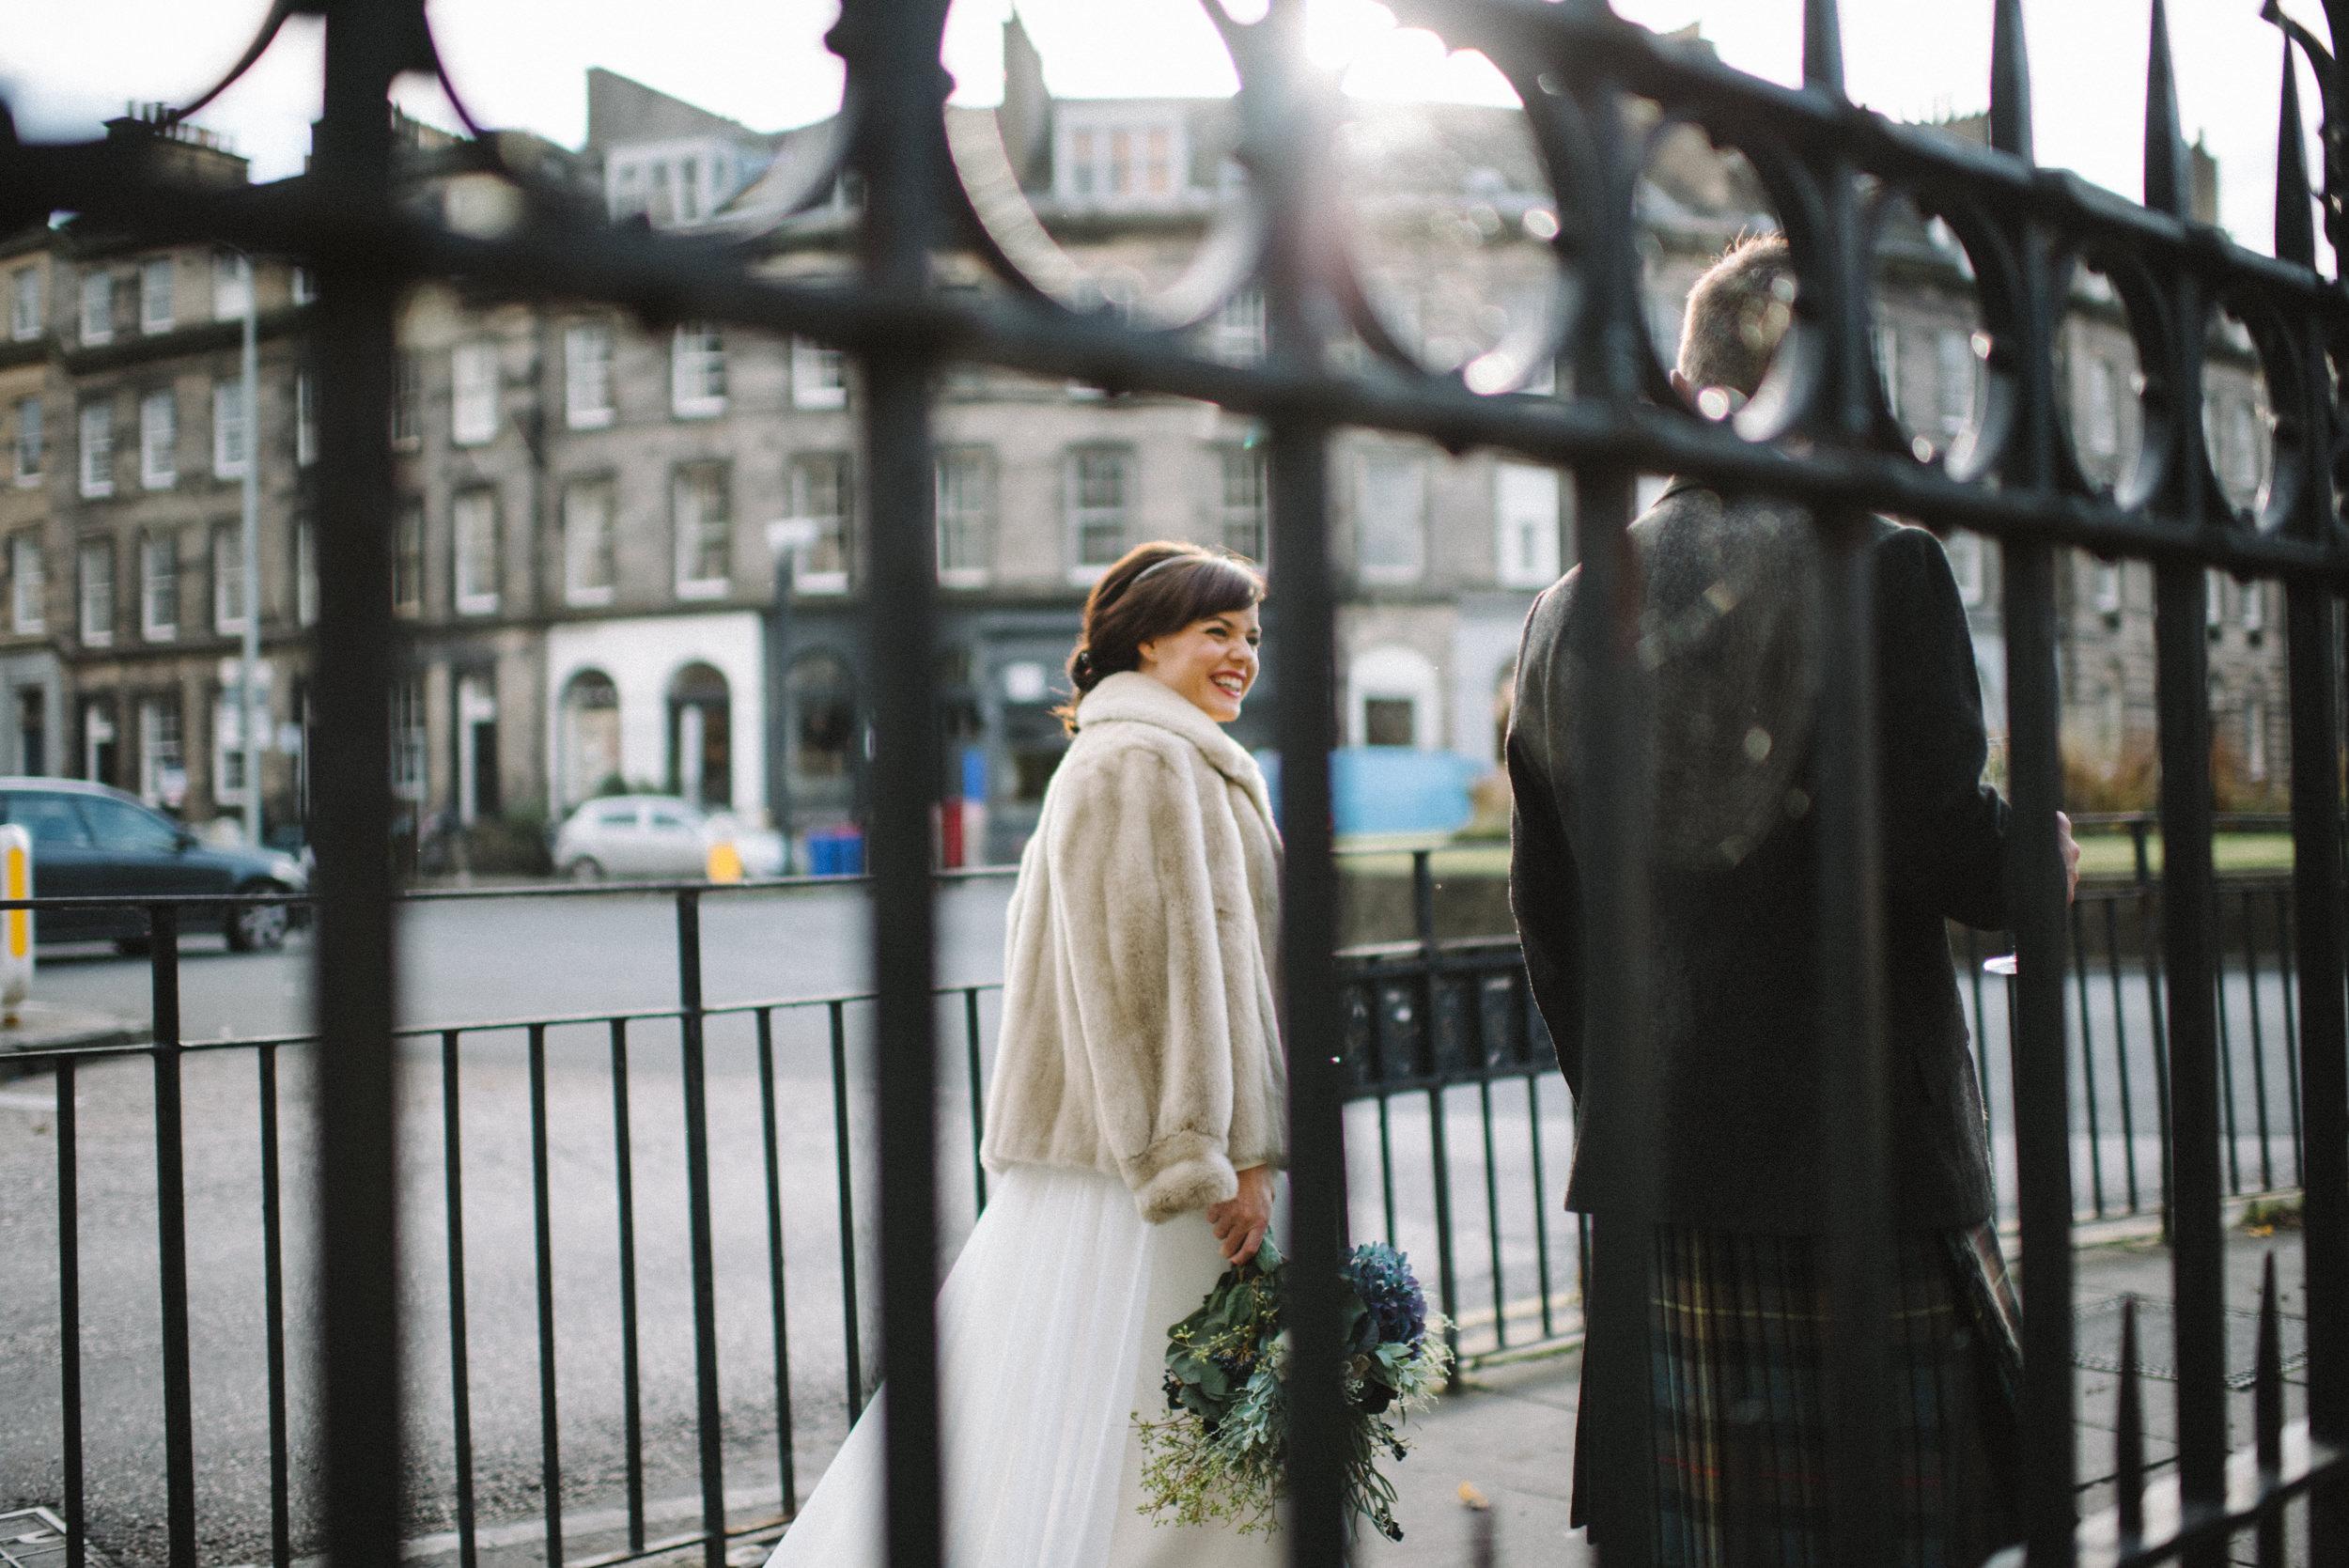 0176-alternative-wedding-portrait-family-kids-photographer-glasgow-scotland.JPG